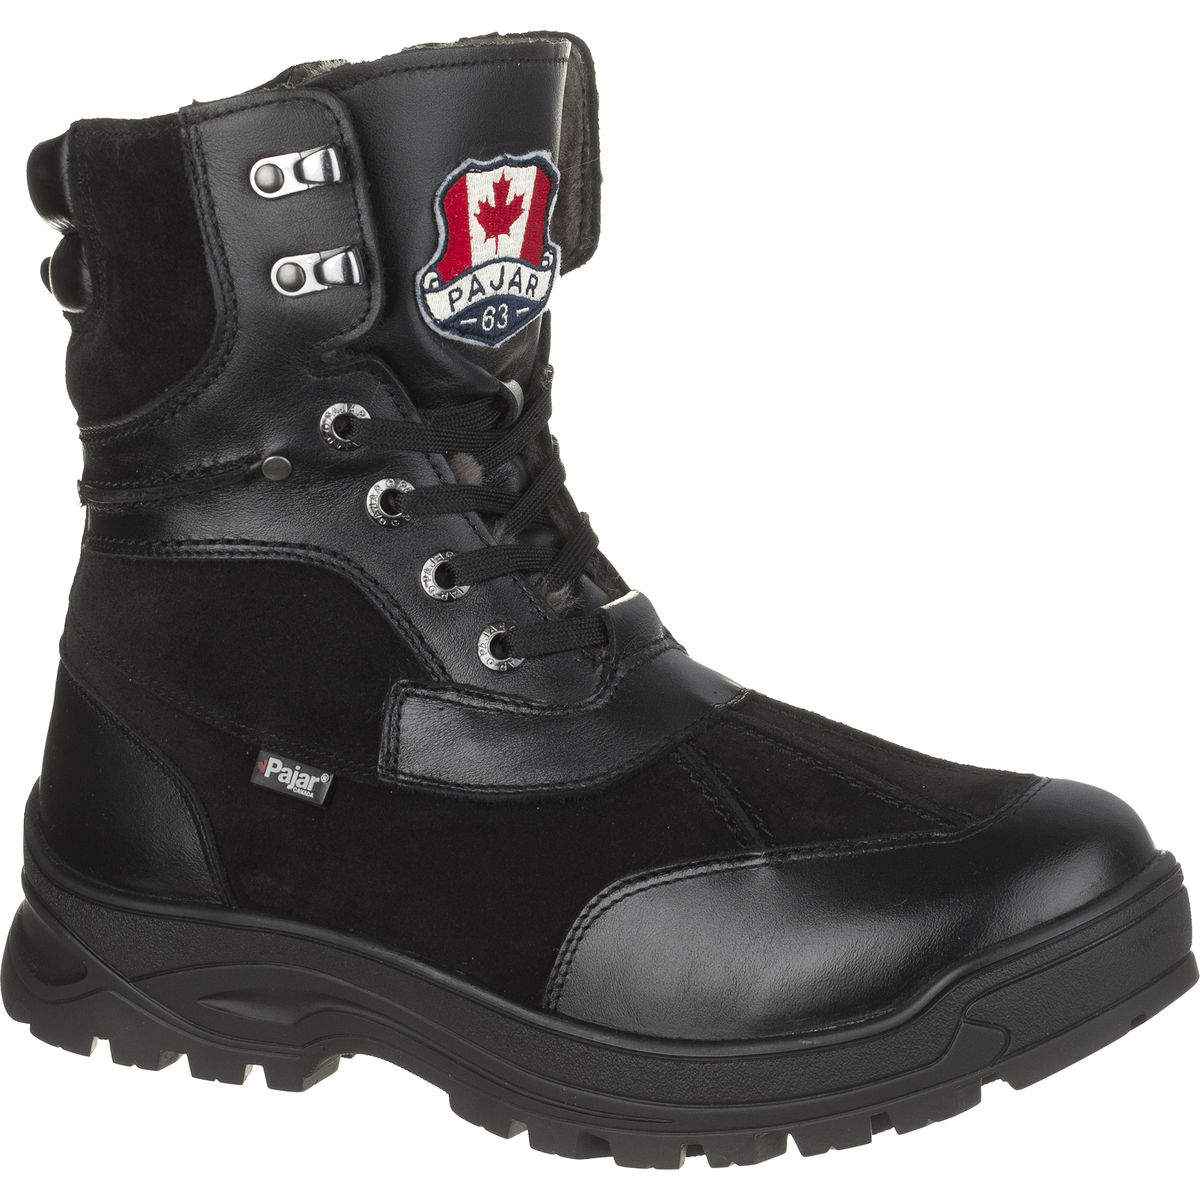 Pajar Canada Carrefour Glacier Boot  Mens